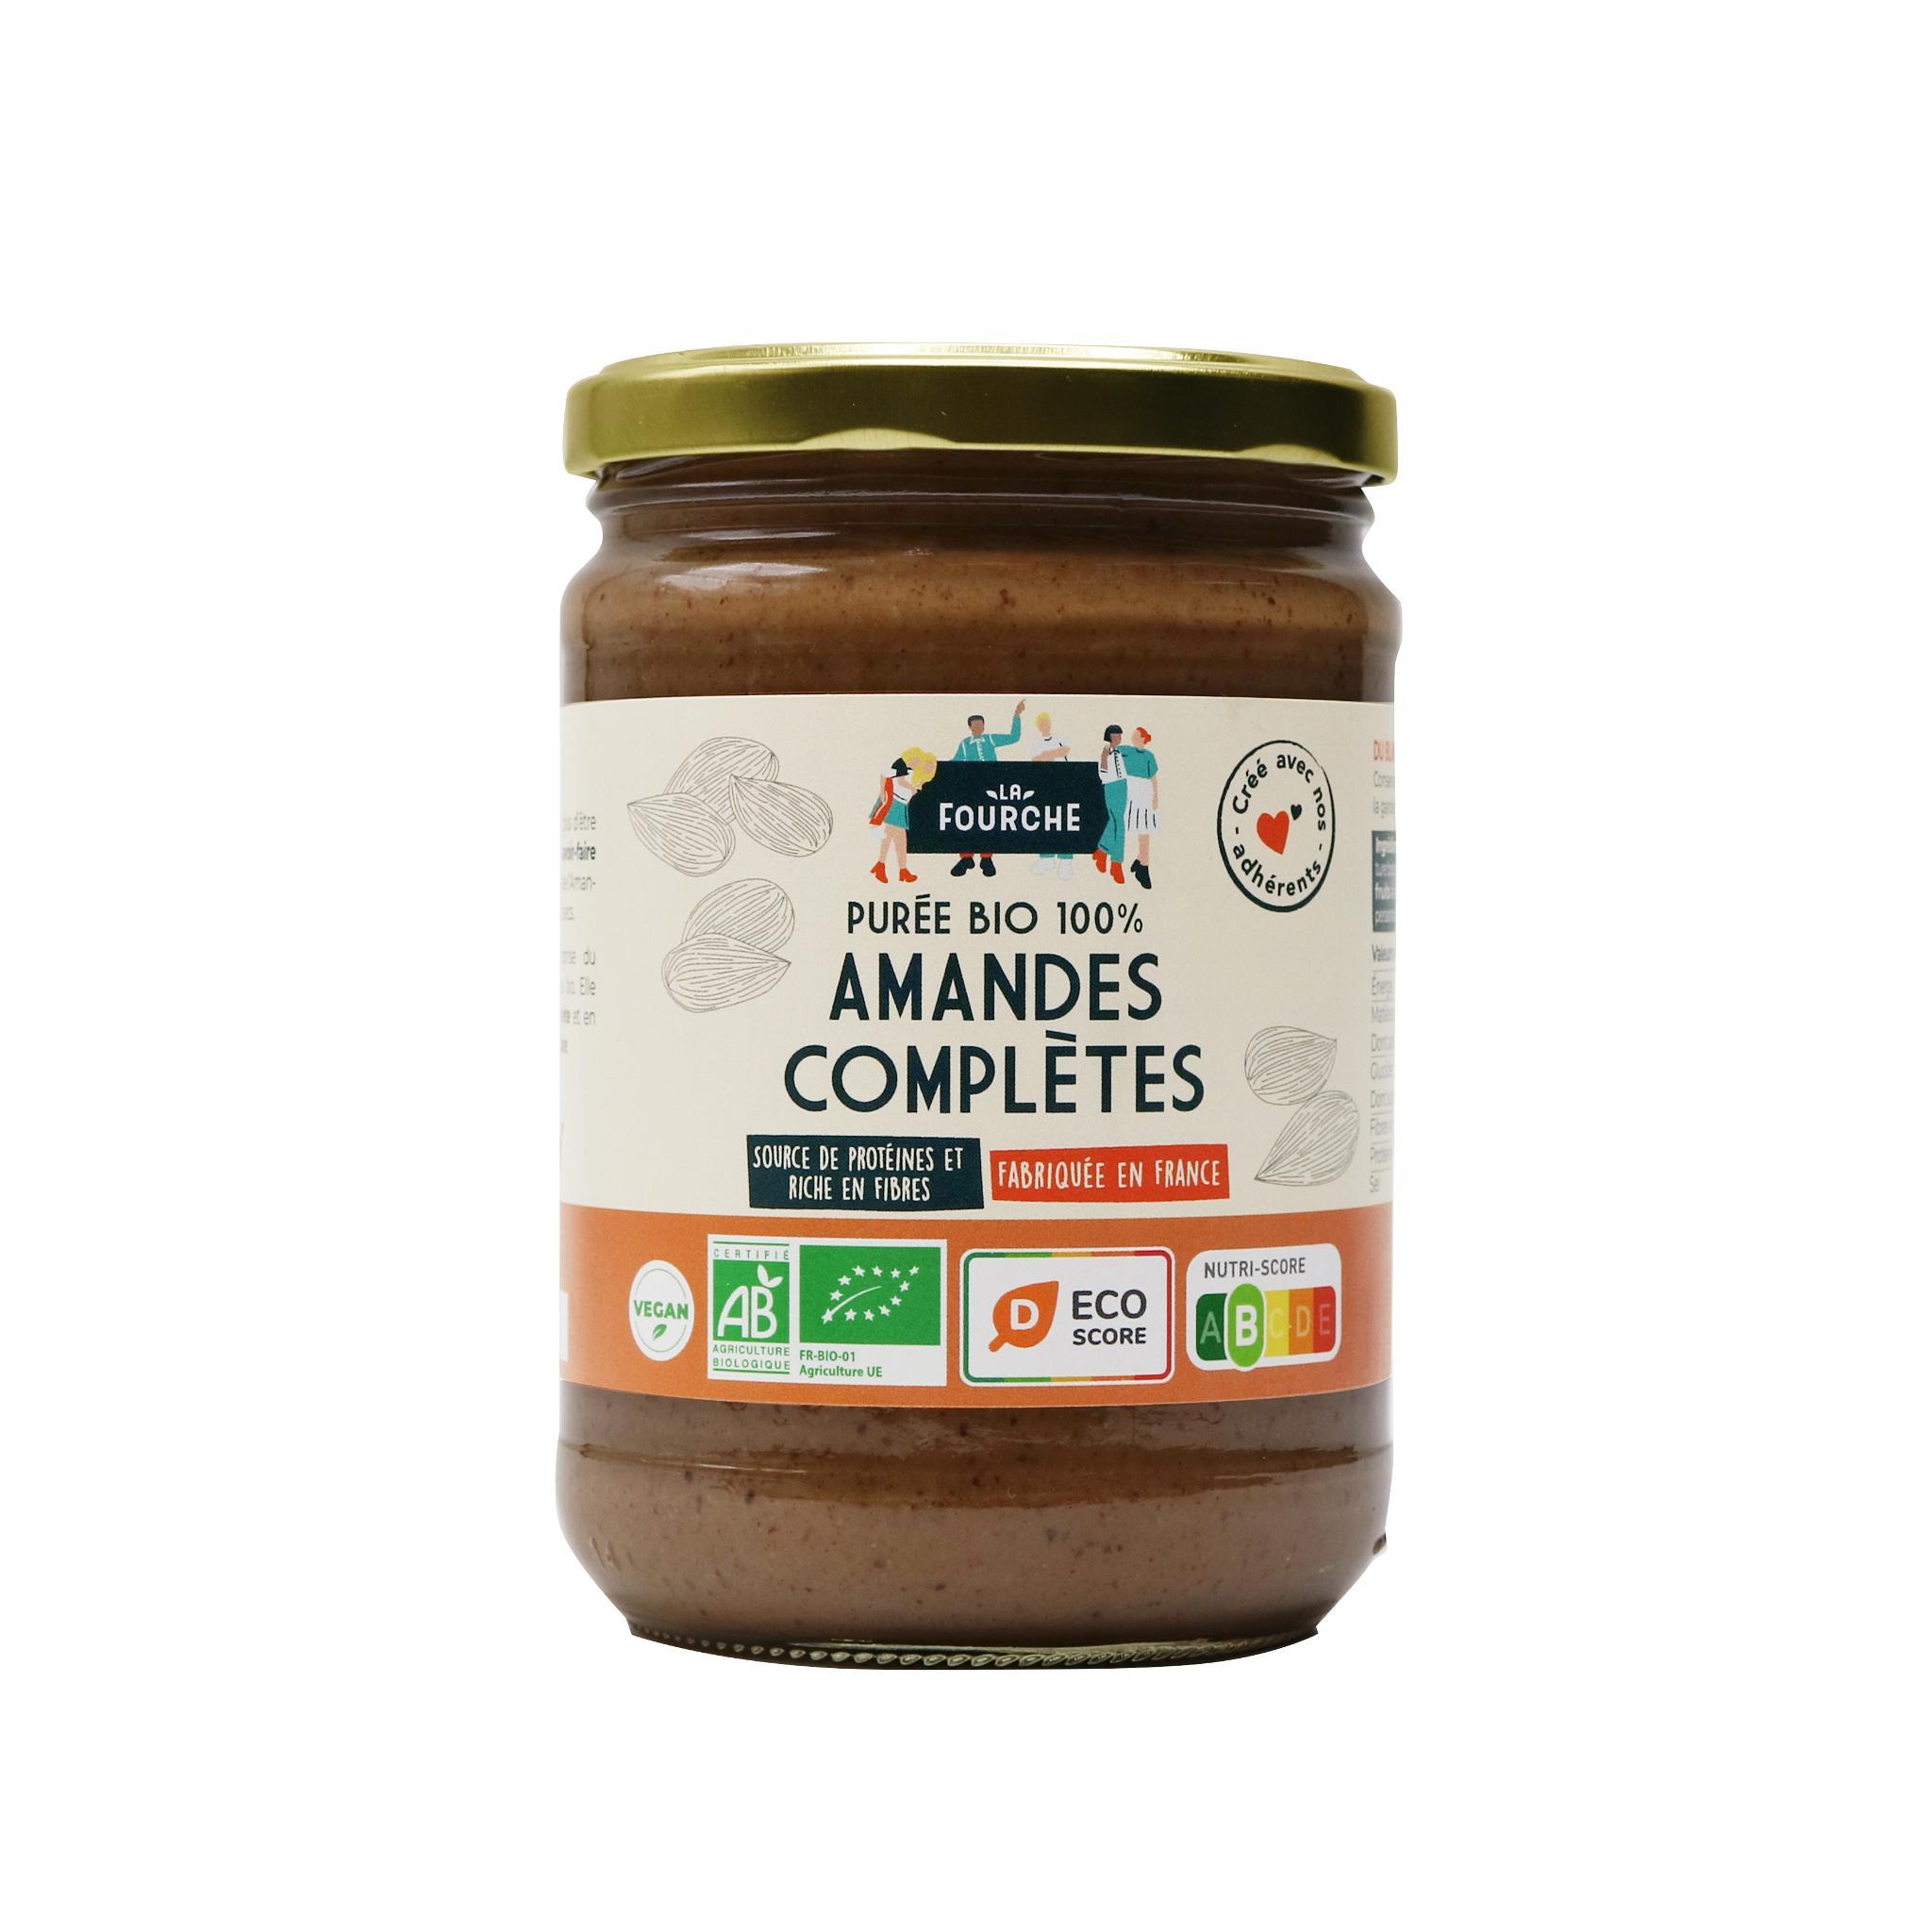 img-la-fourche-puree-100-amandes-completes-bio-0-5kg